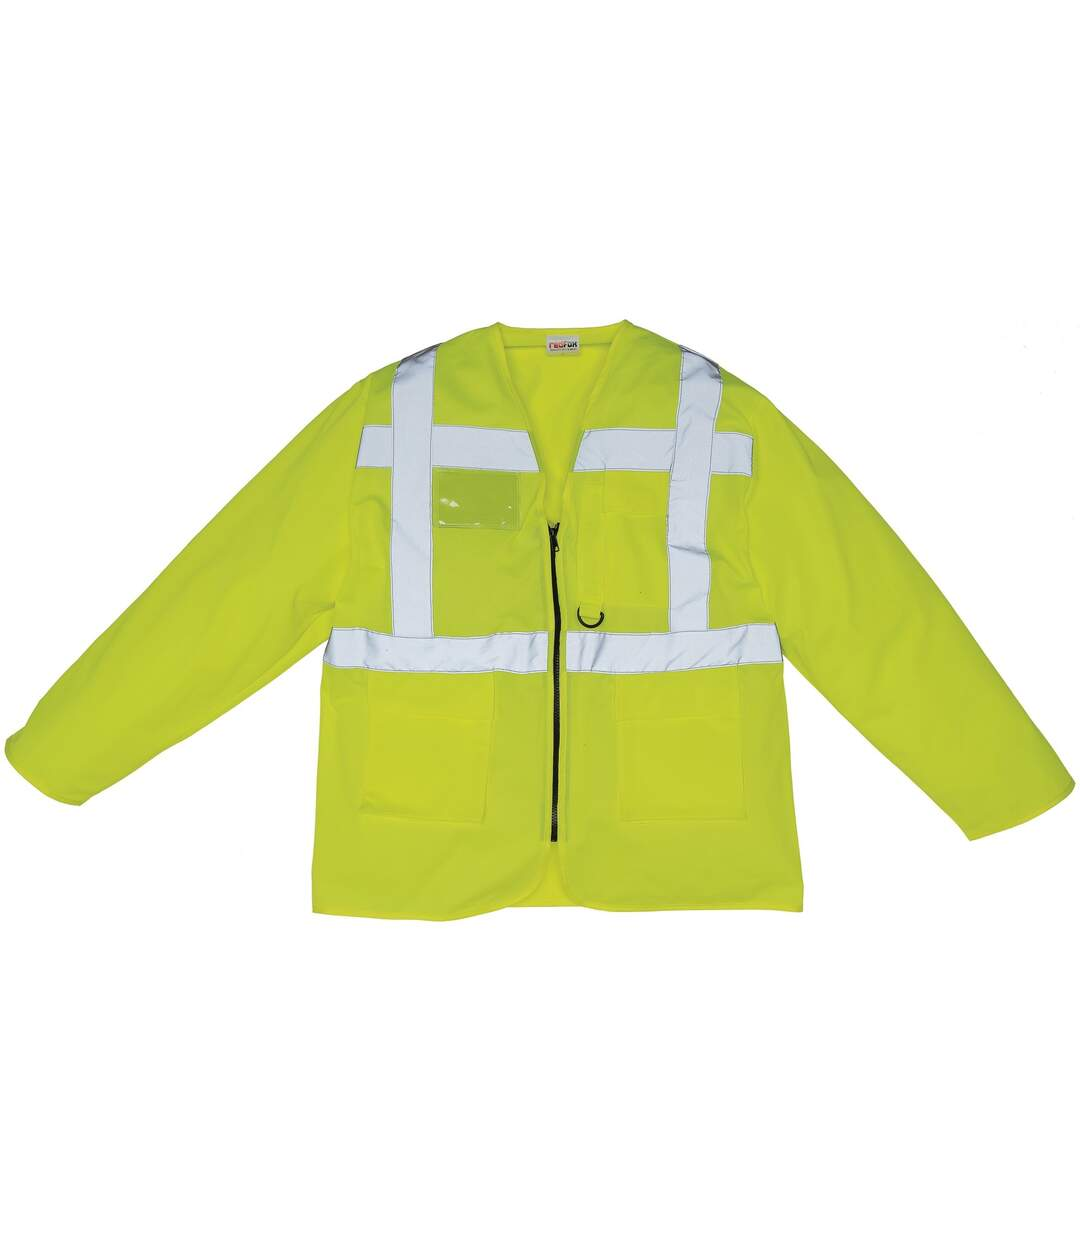 Yoko Mens Executive Hi-Vis Long Sleeve Safety Waistcoat (Pack of 2) (Hi-Vis Yellow) - UTBC4397